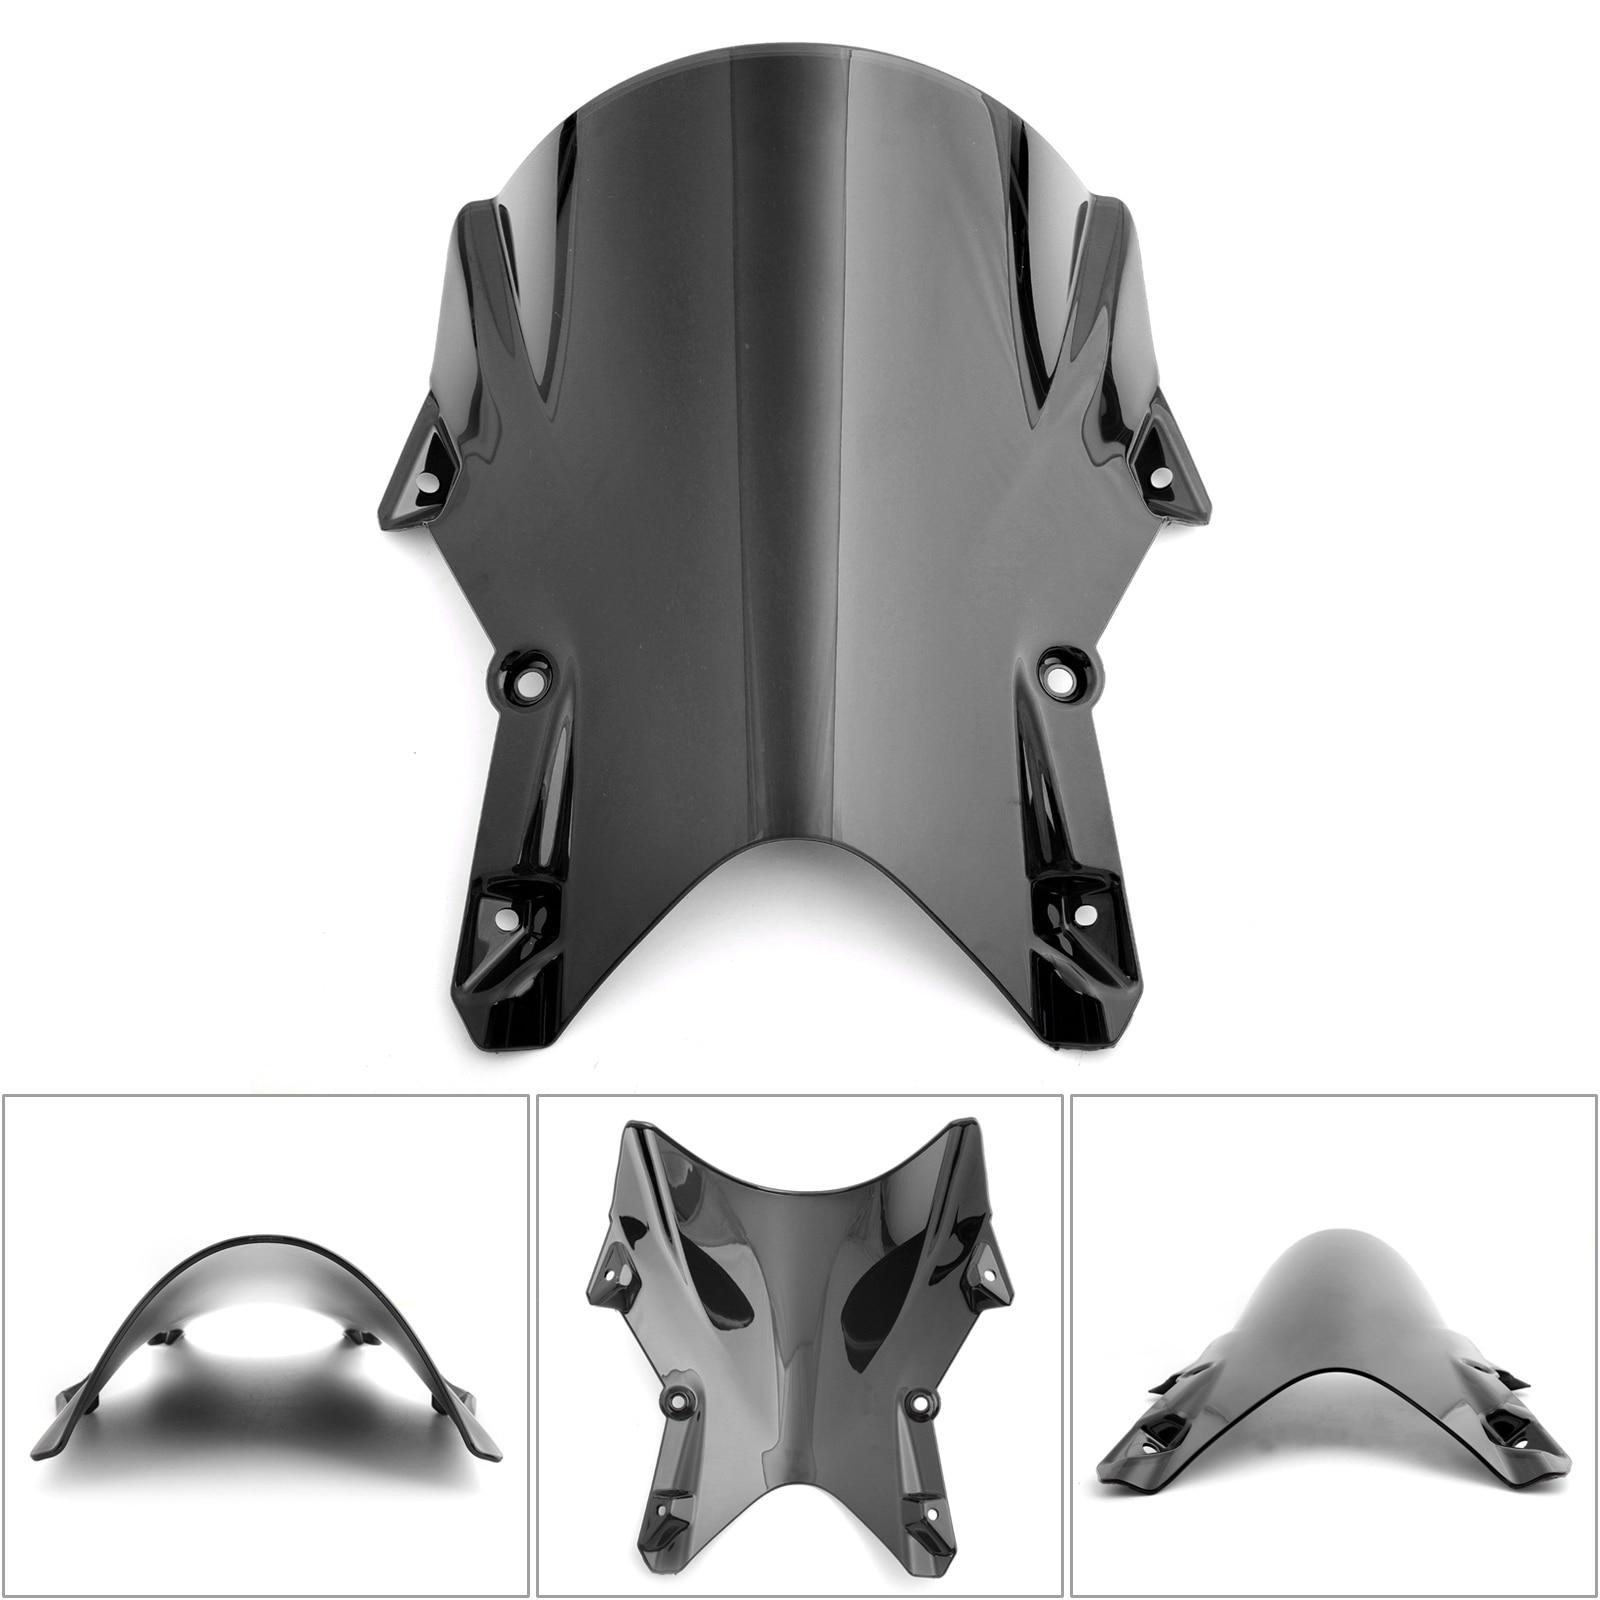 Artudatech Moto Parabrisas Motocicleta Delantero Parabrisas Windshield Windscreen para Trium-ph Day-tona 675 2013-2016